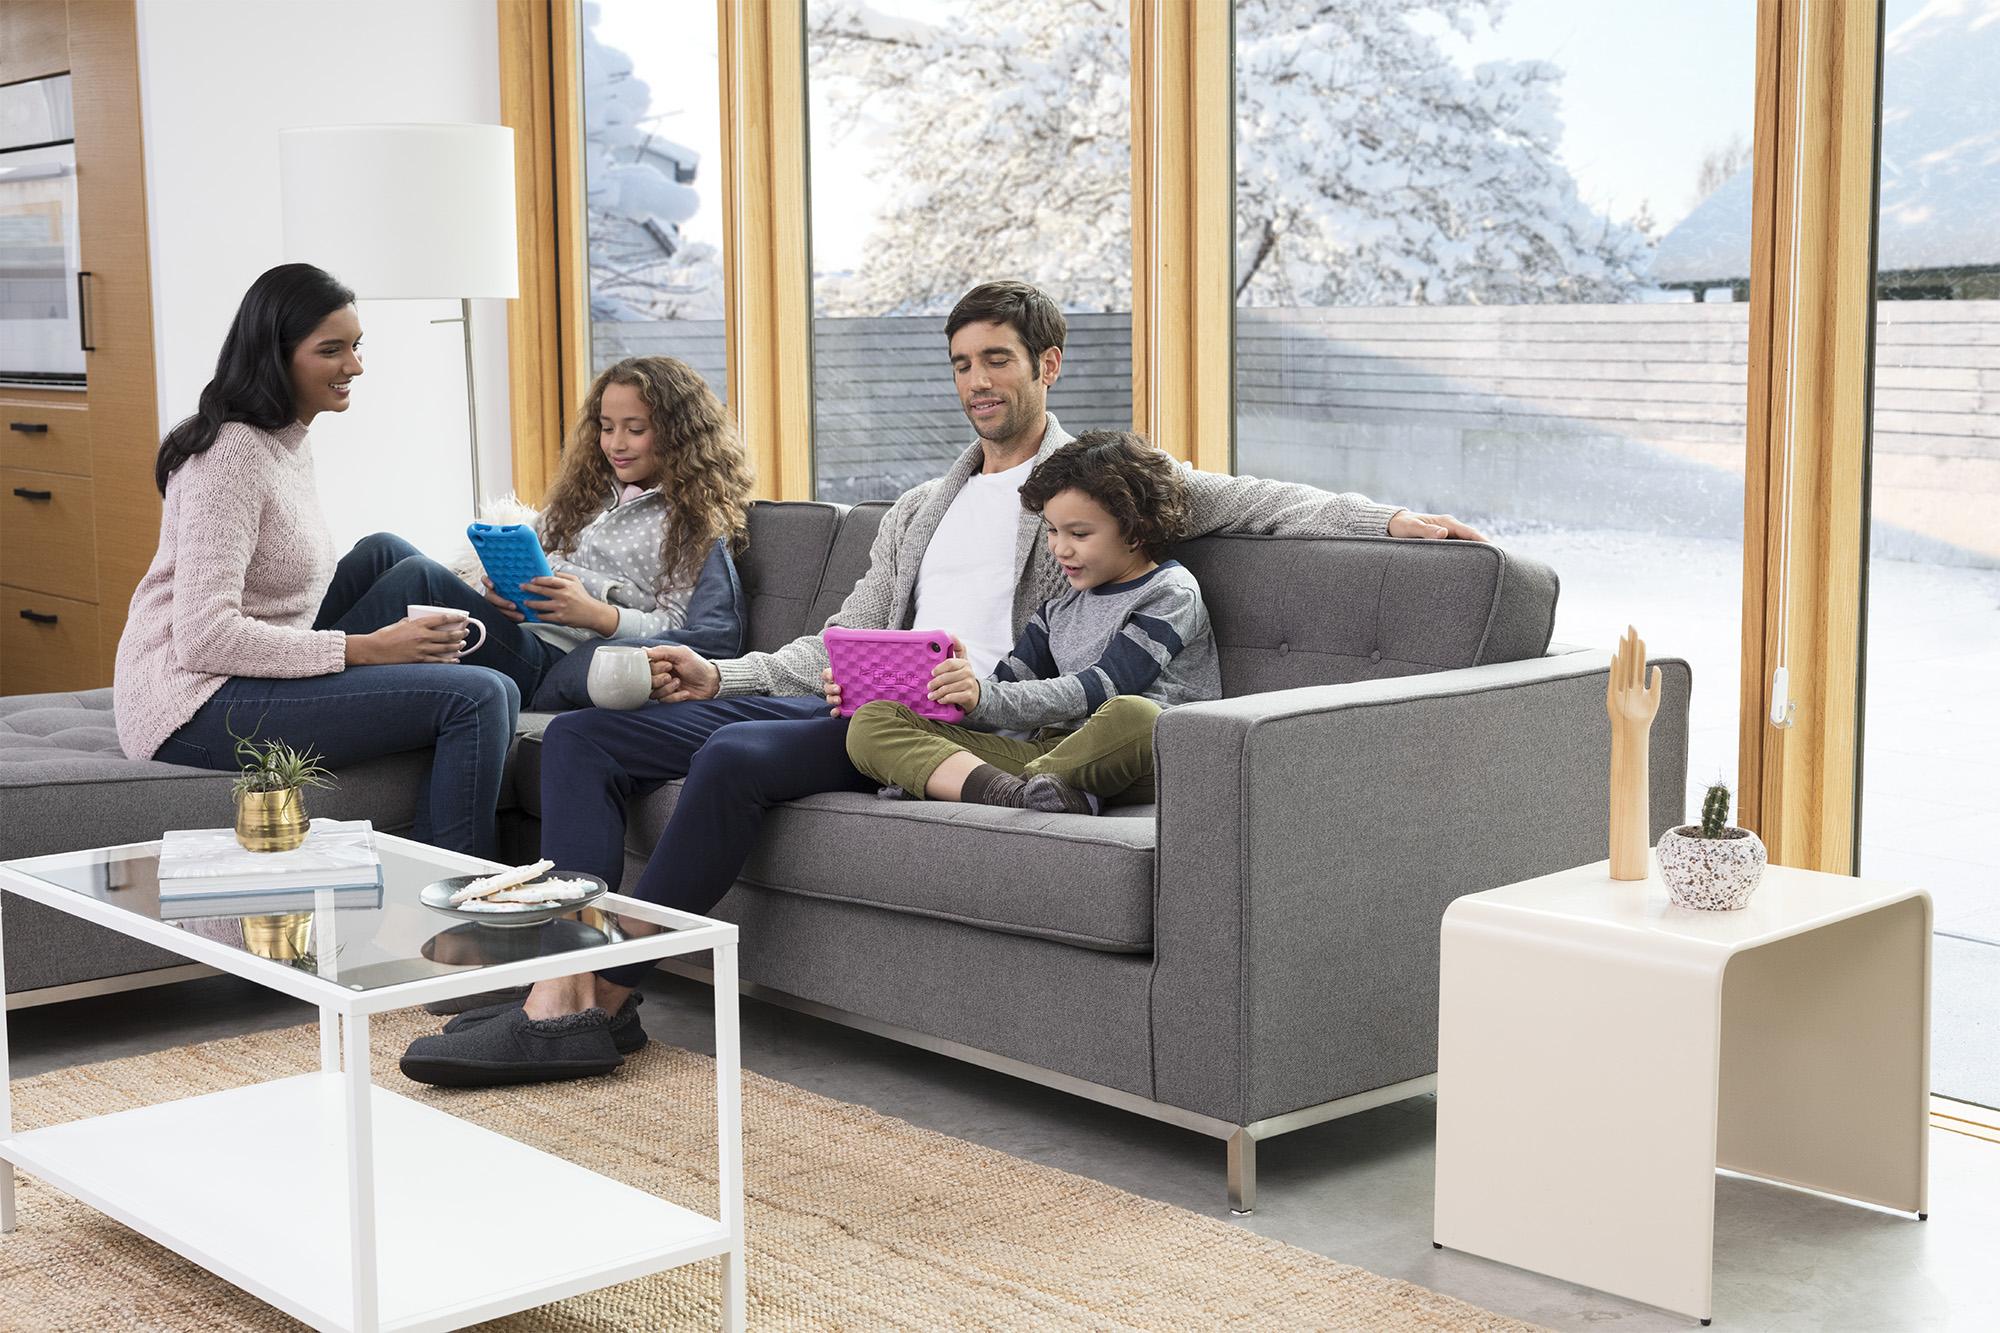 Tabfam_Livingroom_Holiday_Entertainment_1011_V2_After.jpg